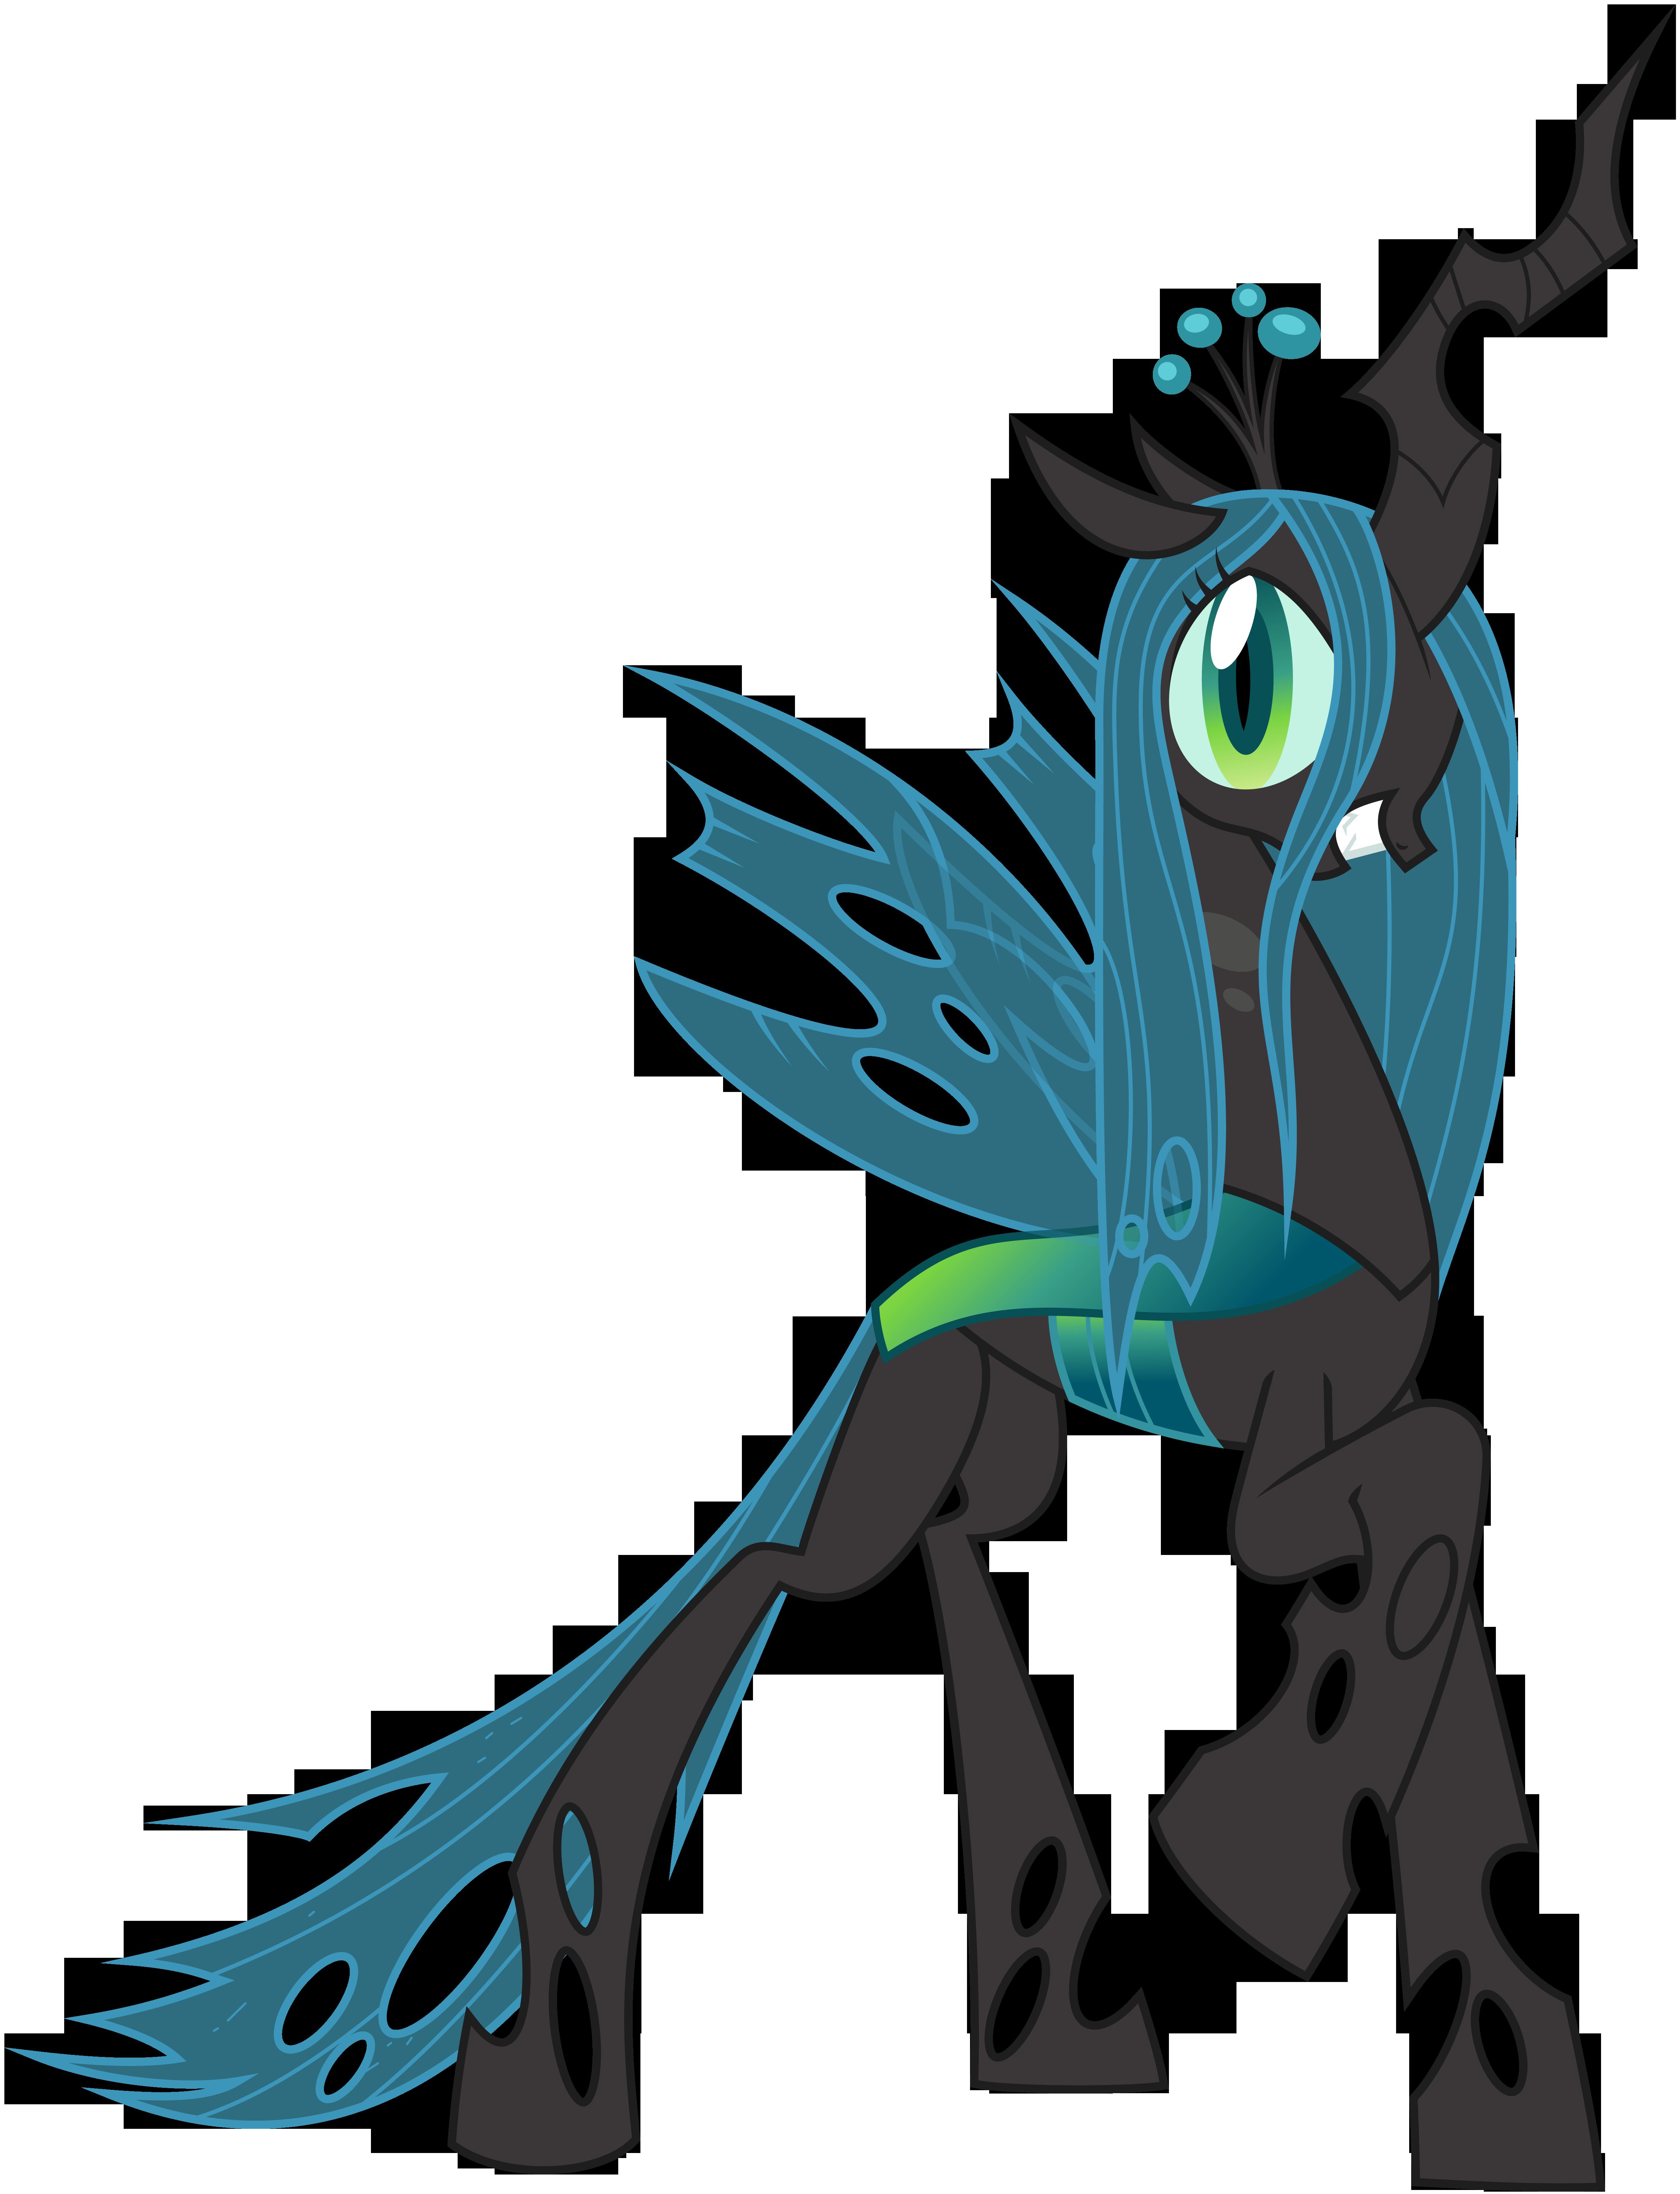 Queen Chrysalis Vector by BluePedro on DeviantArt